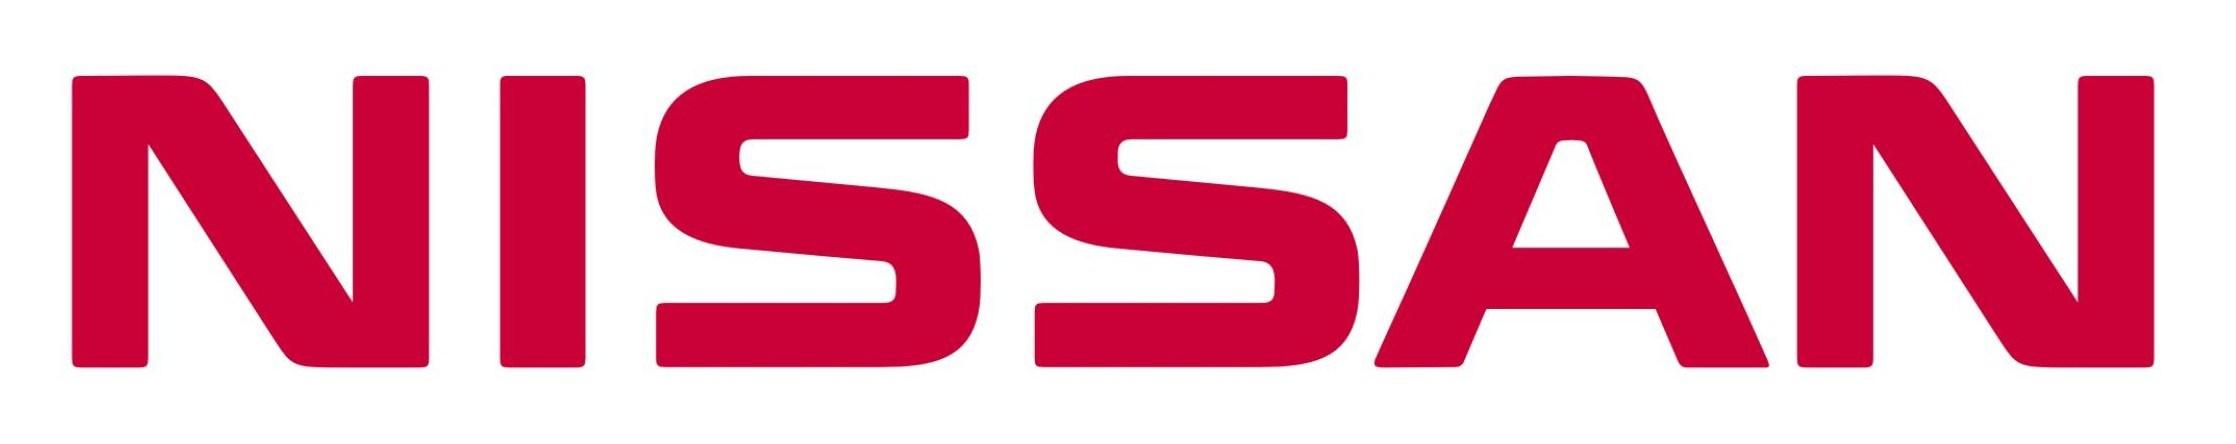 nissan motor logo eps pdf files vector eps free download logo rh freelogovectors net nissan logo vector art nissan logo vector cdr